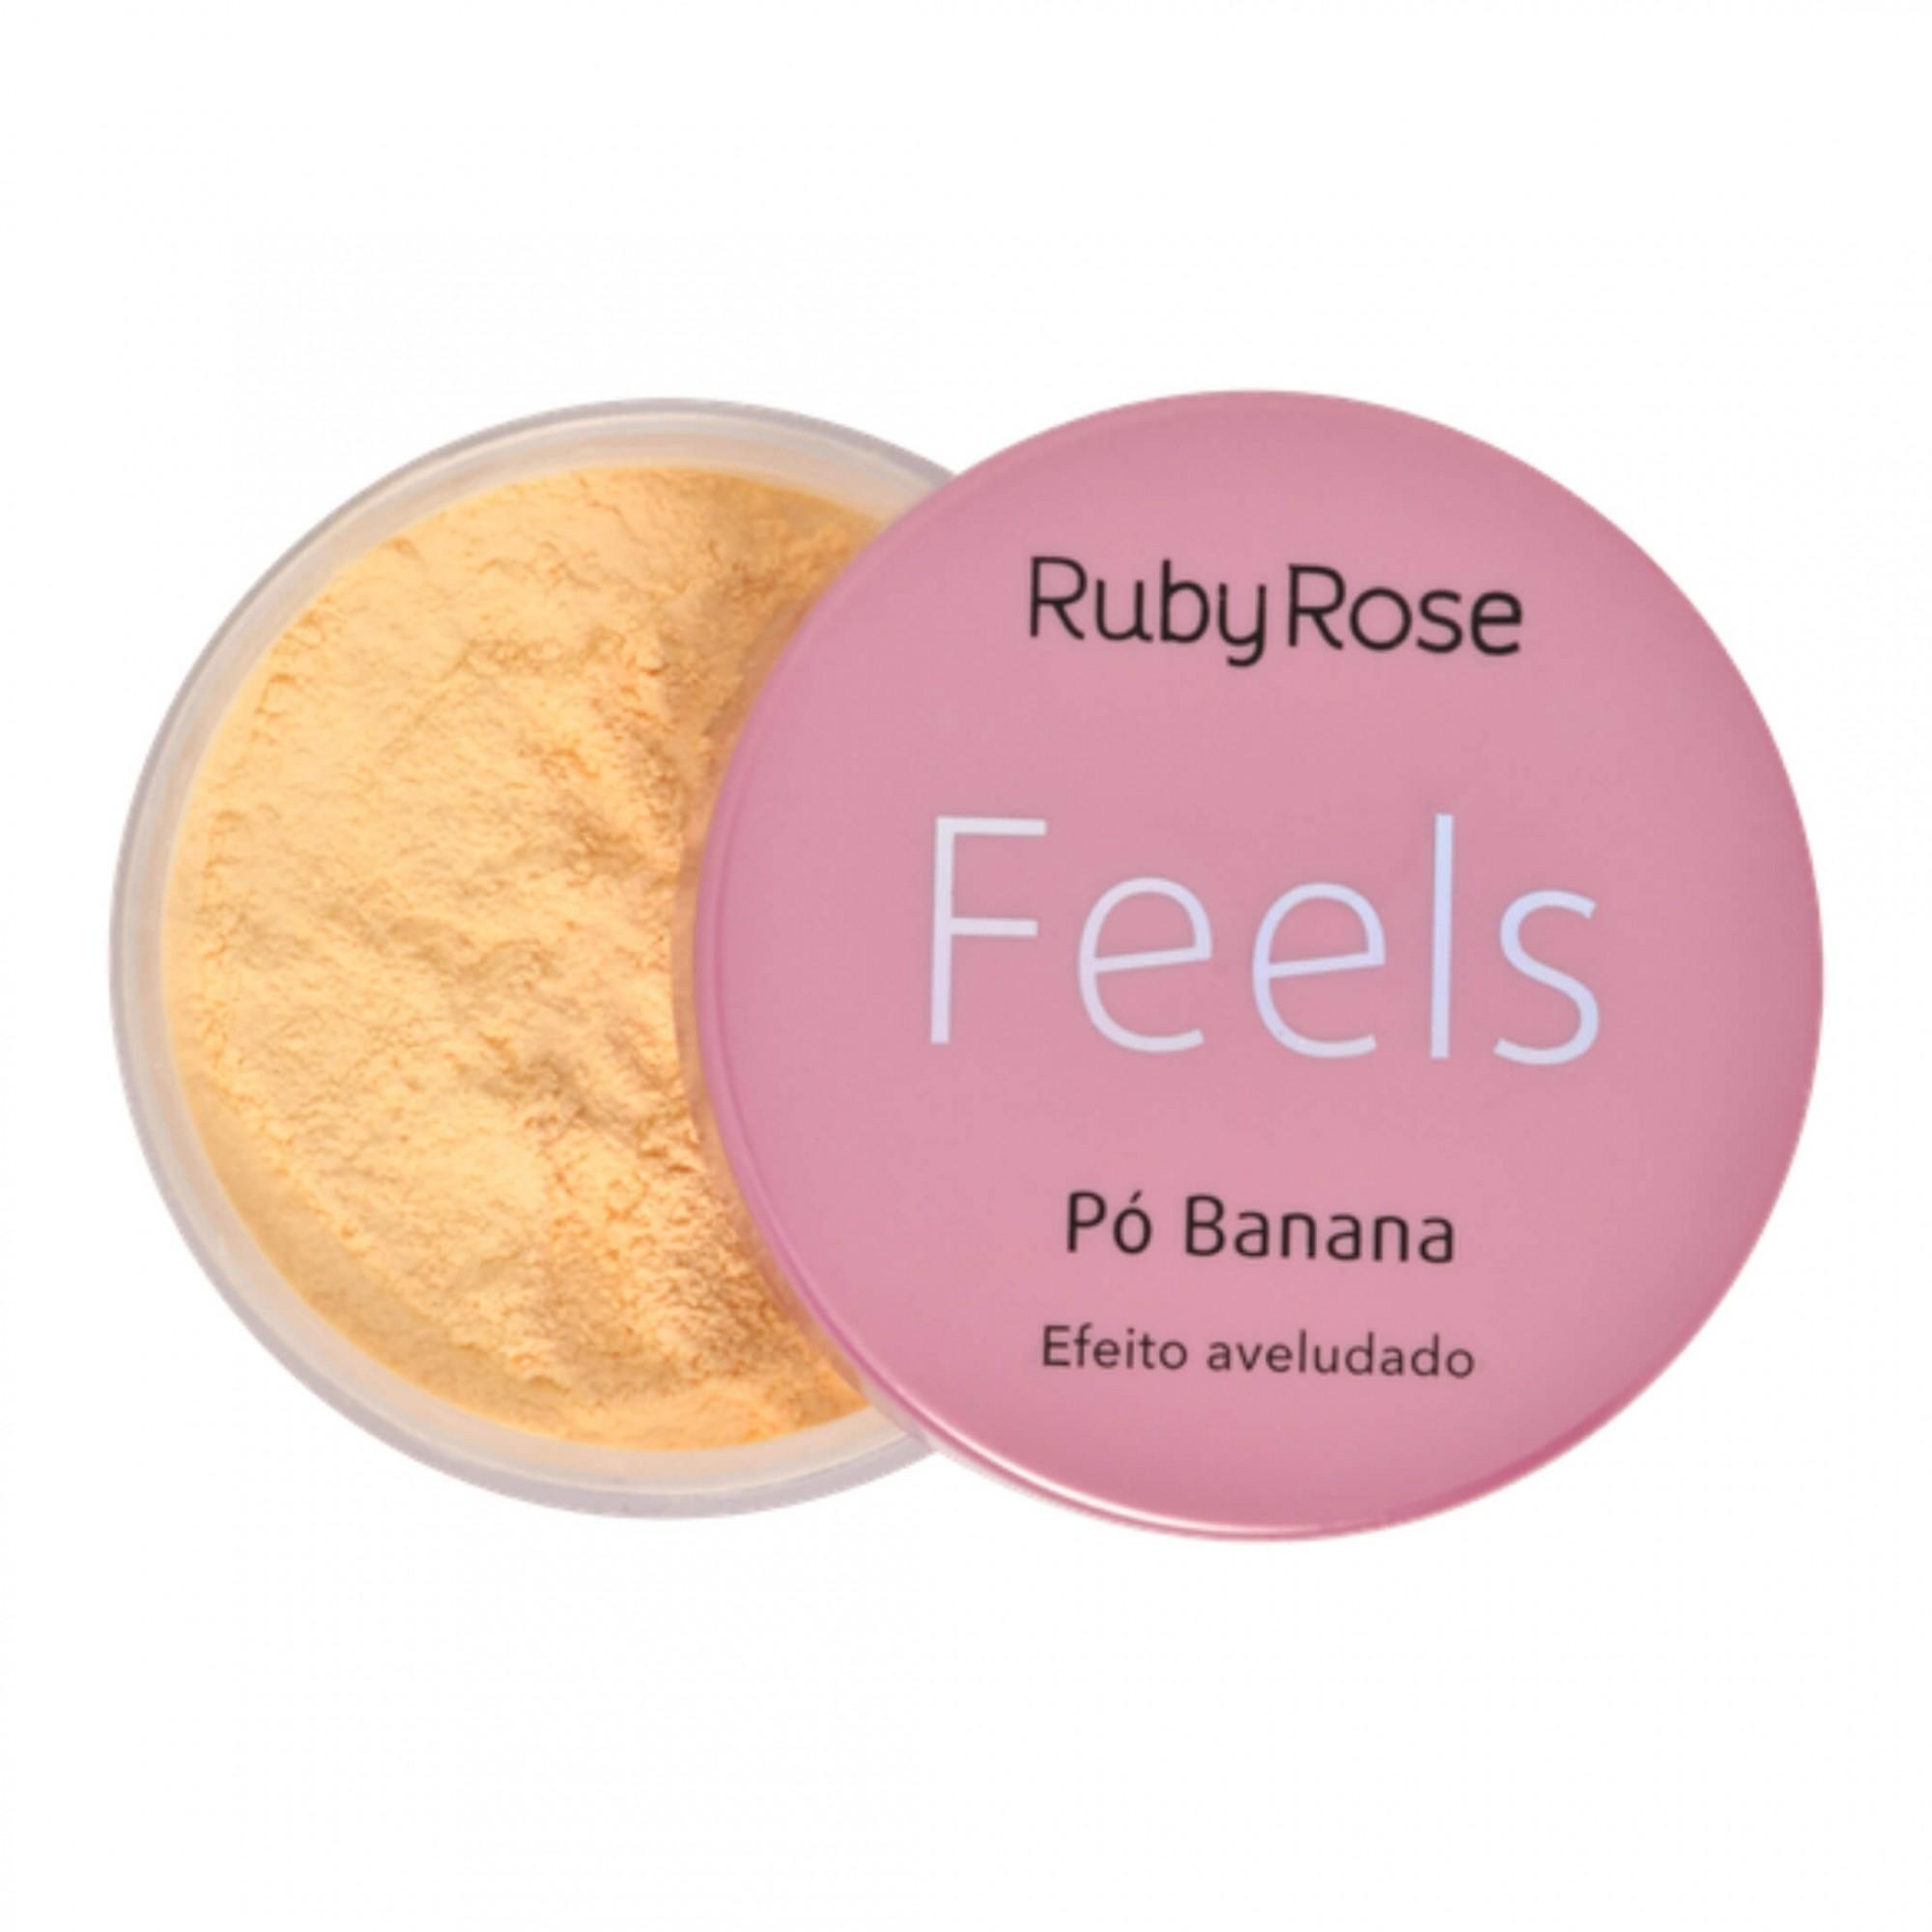 Pó Banana Feels Ruby Rose - 8,5g